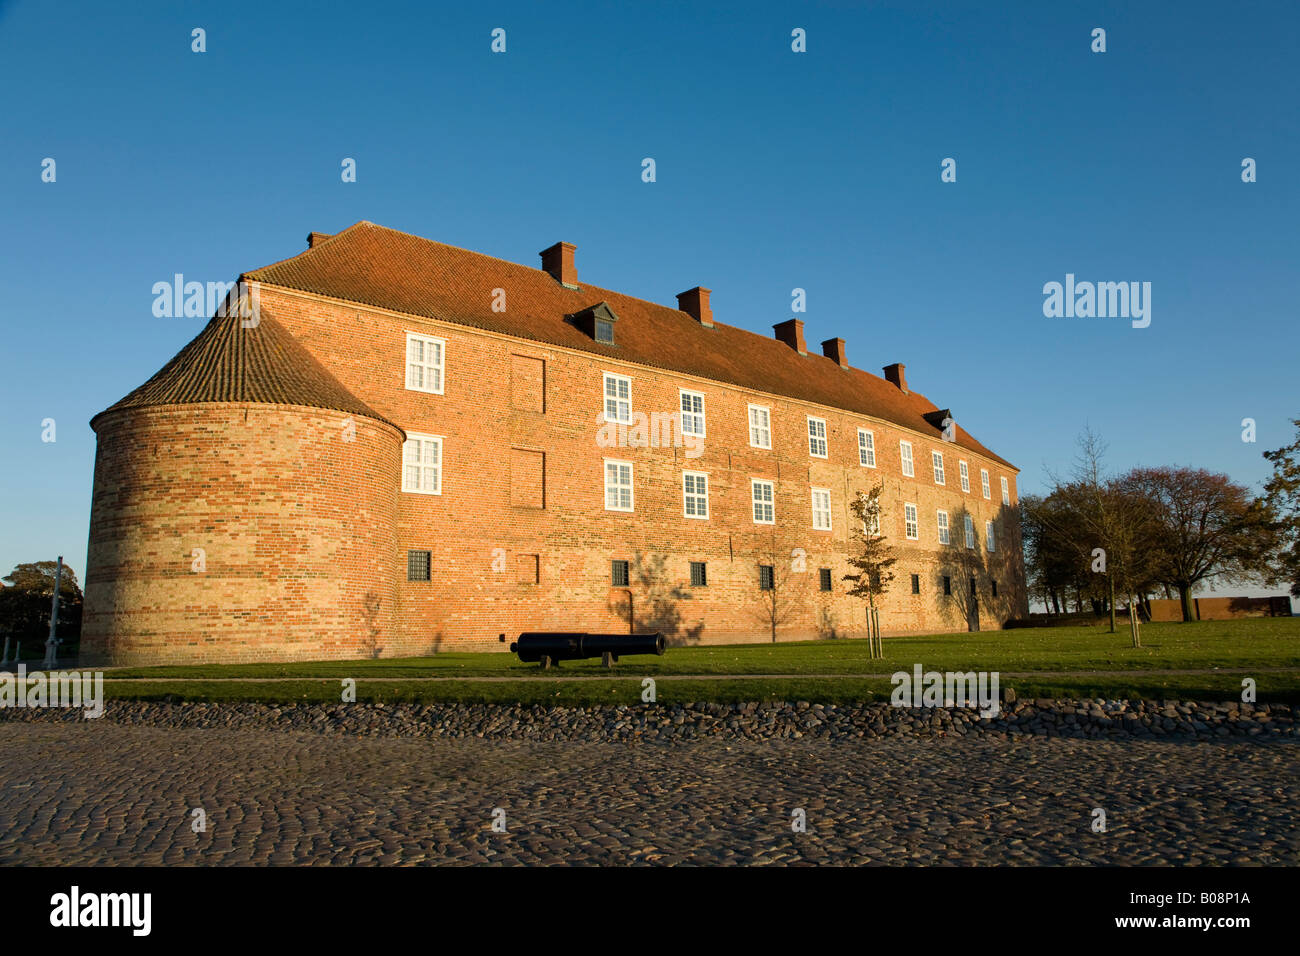 a*site:cheezepizza.blogspot.com ls-island Preview. Sonderborg Castle, Sonderborg, <b>Als Island</b> <b>...</b>